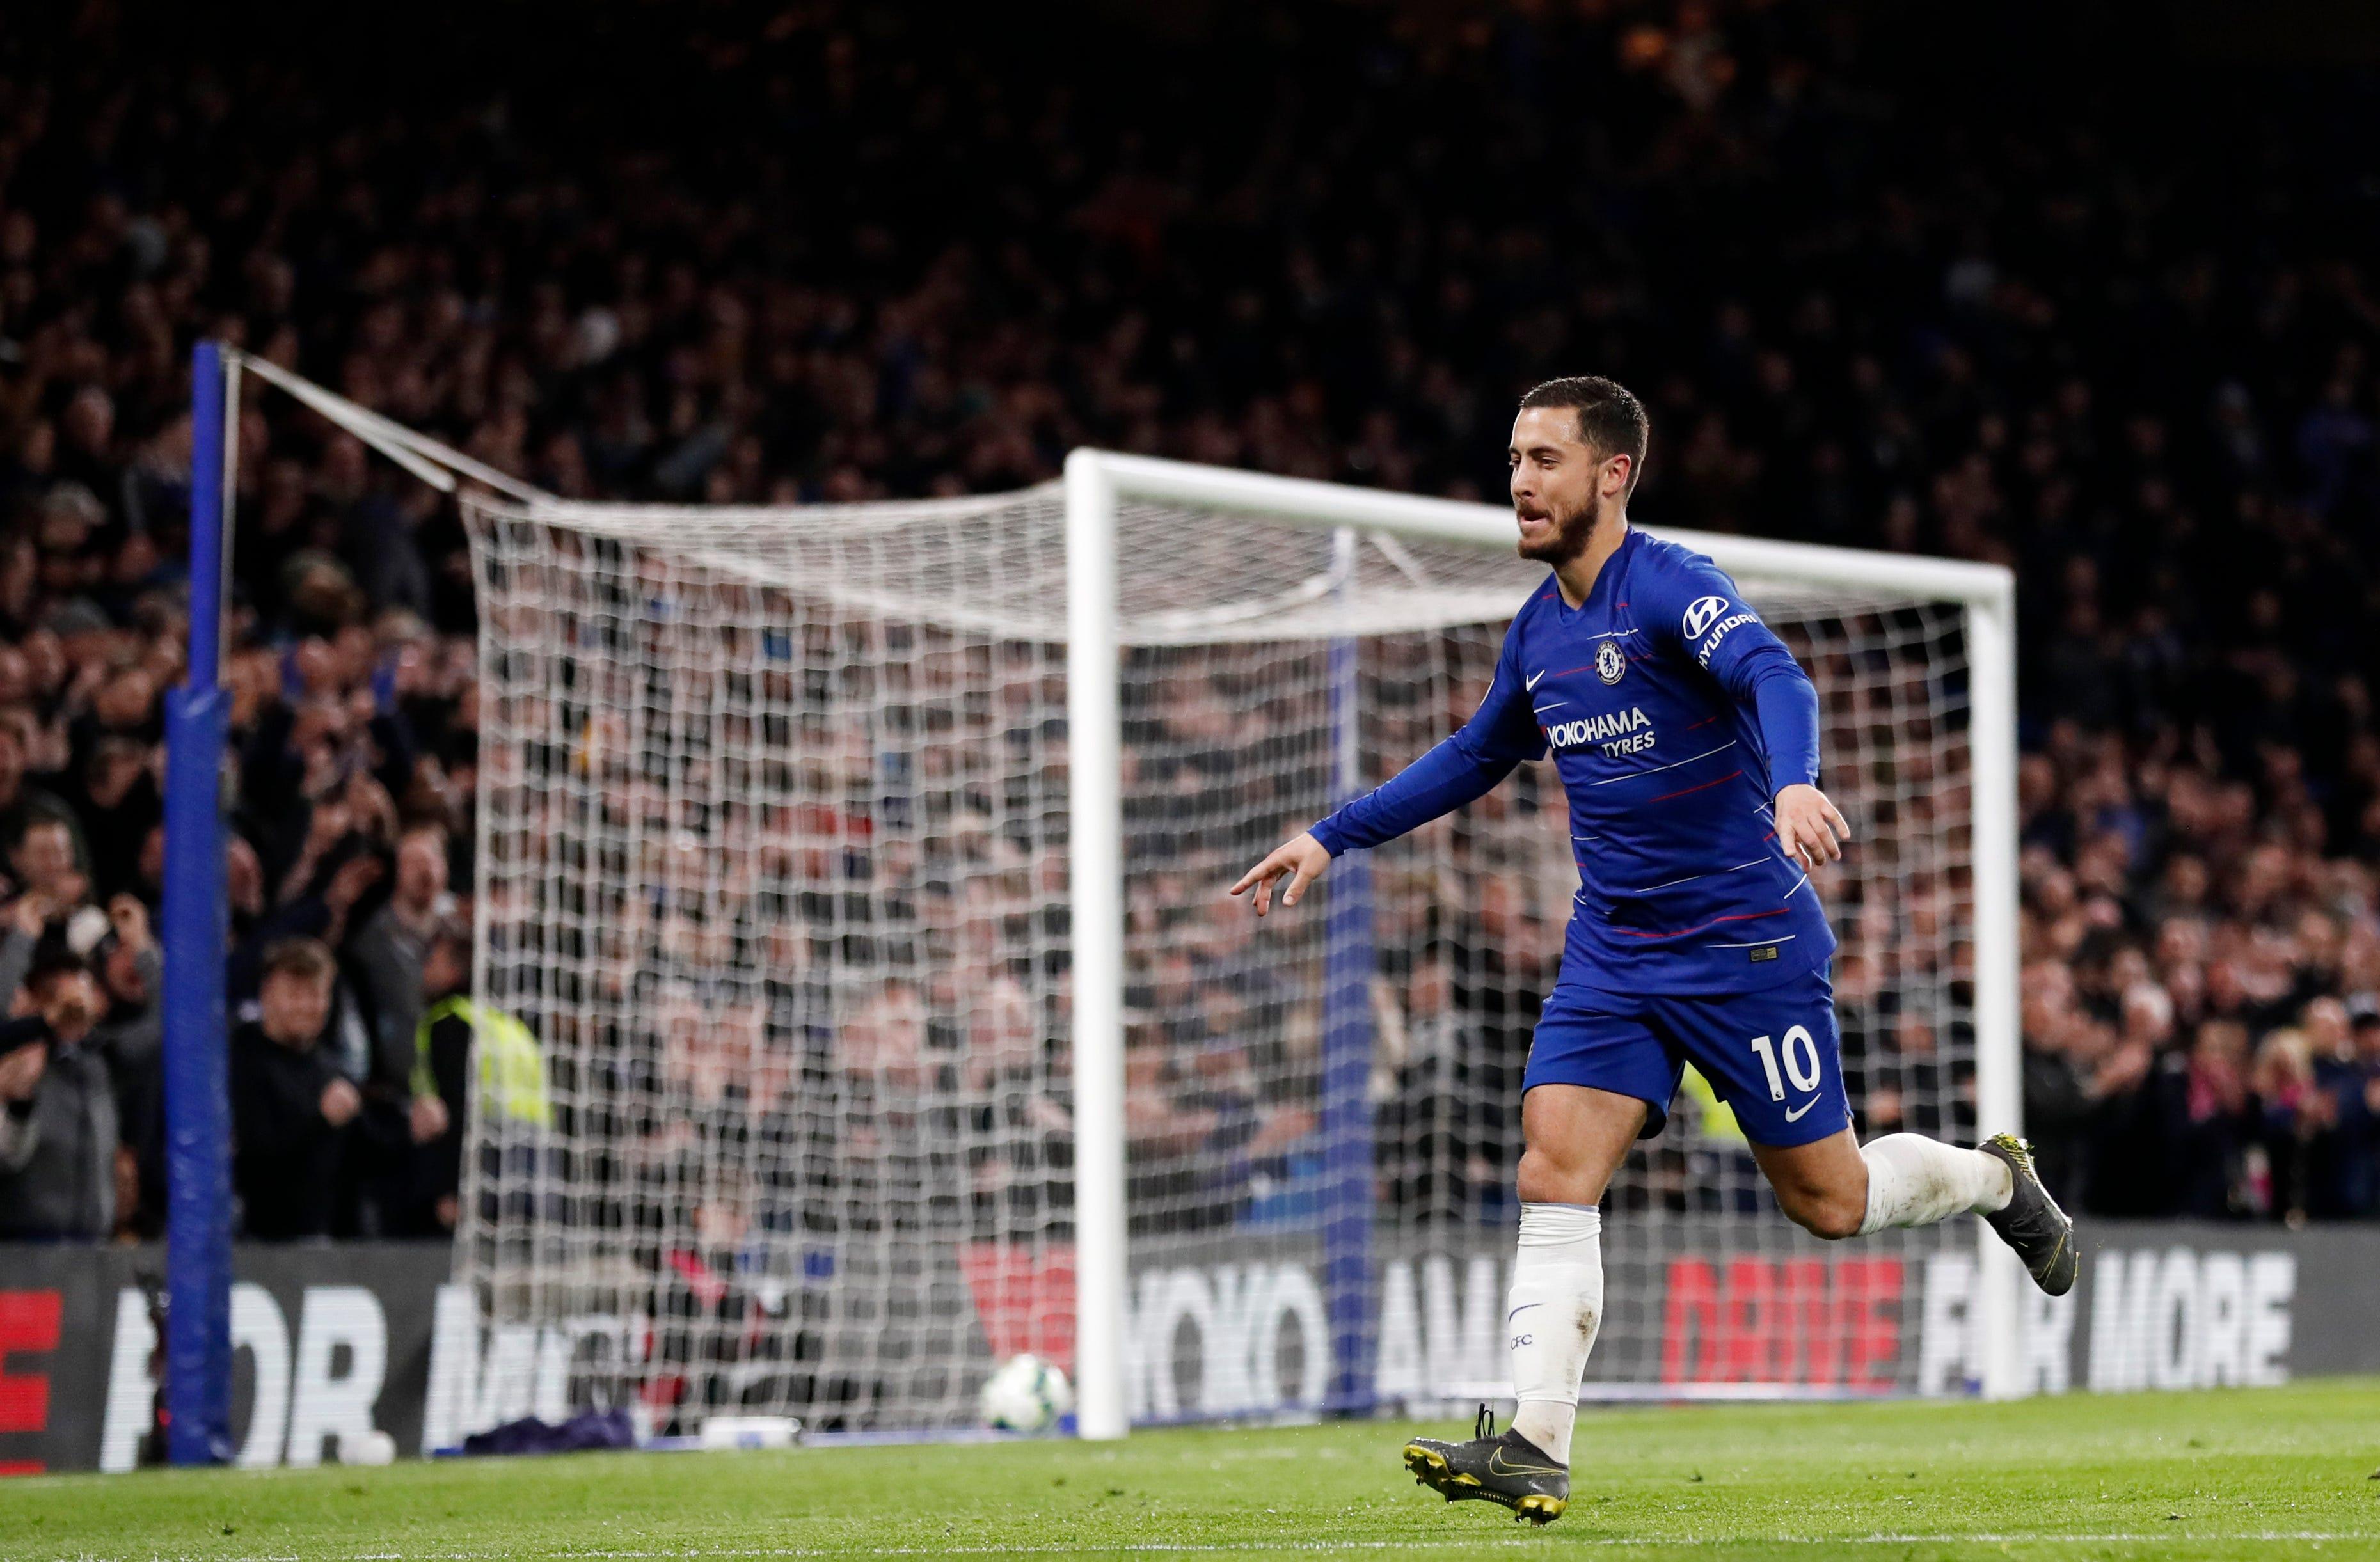 Hudson-Odoi shines for Chelsea in 3-0 win over Brighton